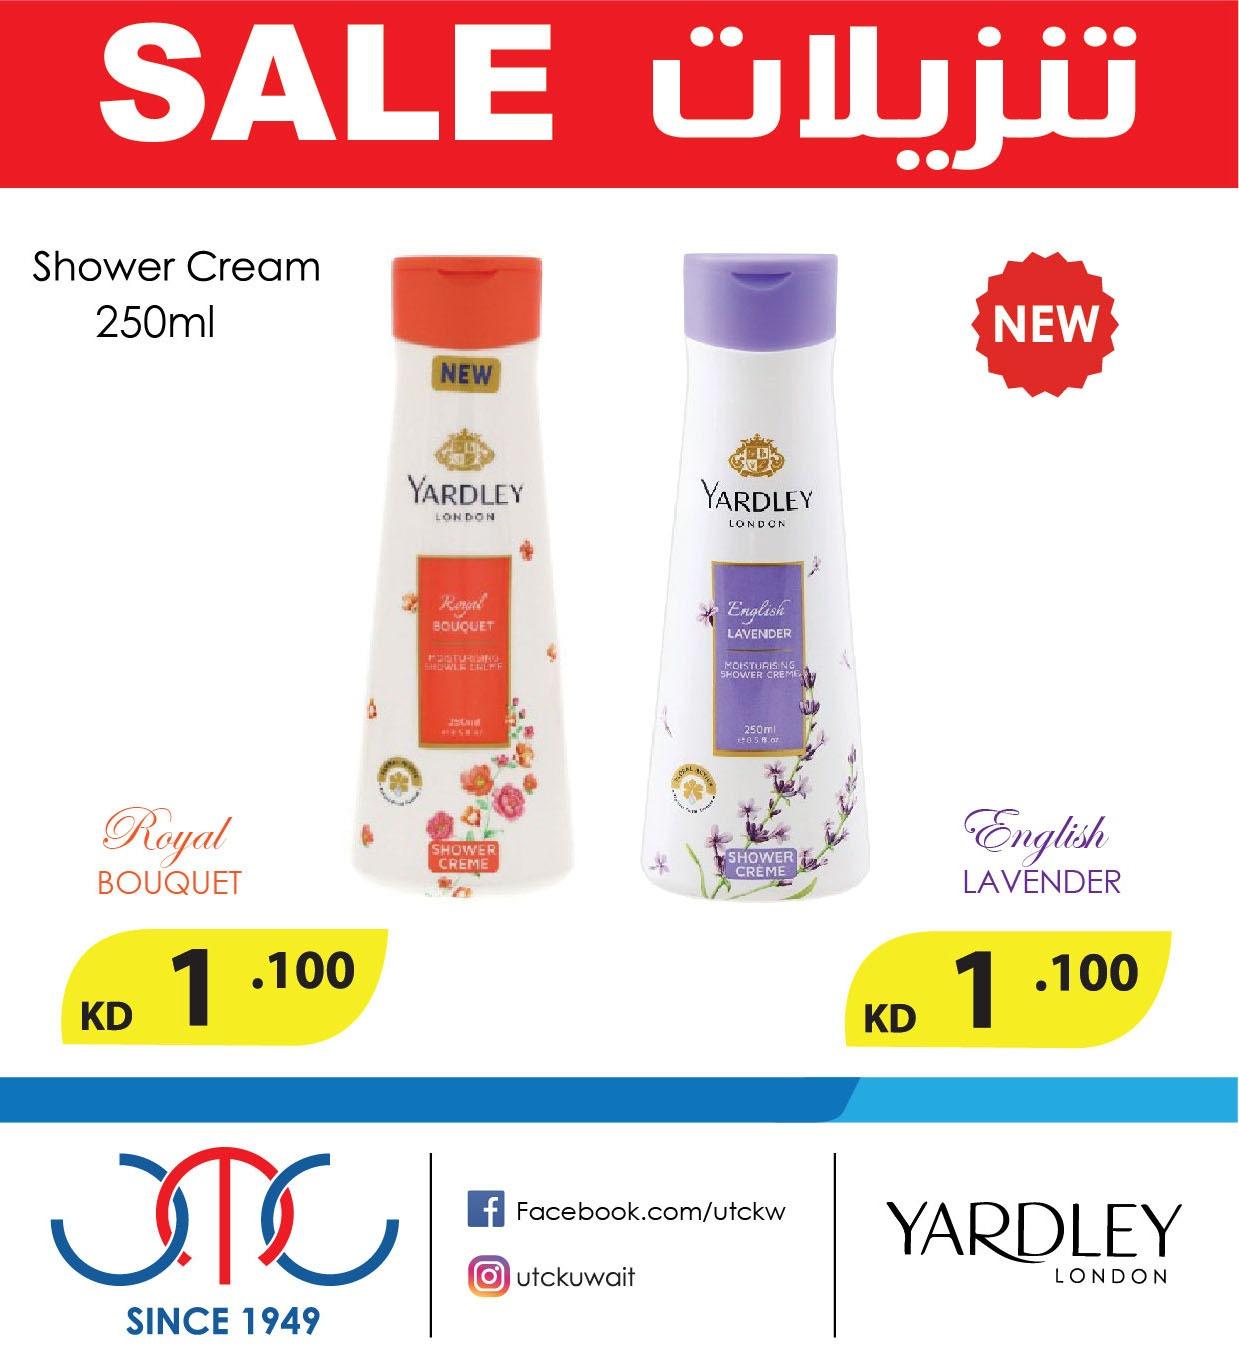 yardly shower cream